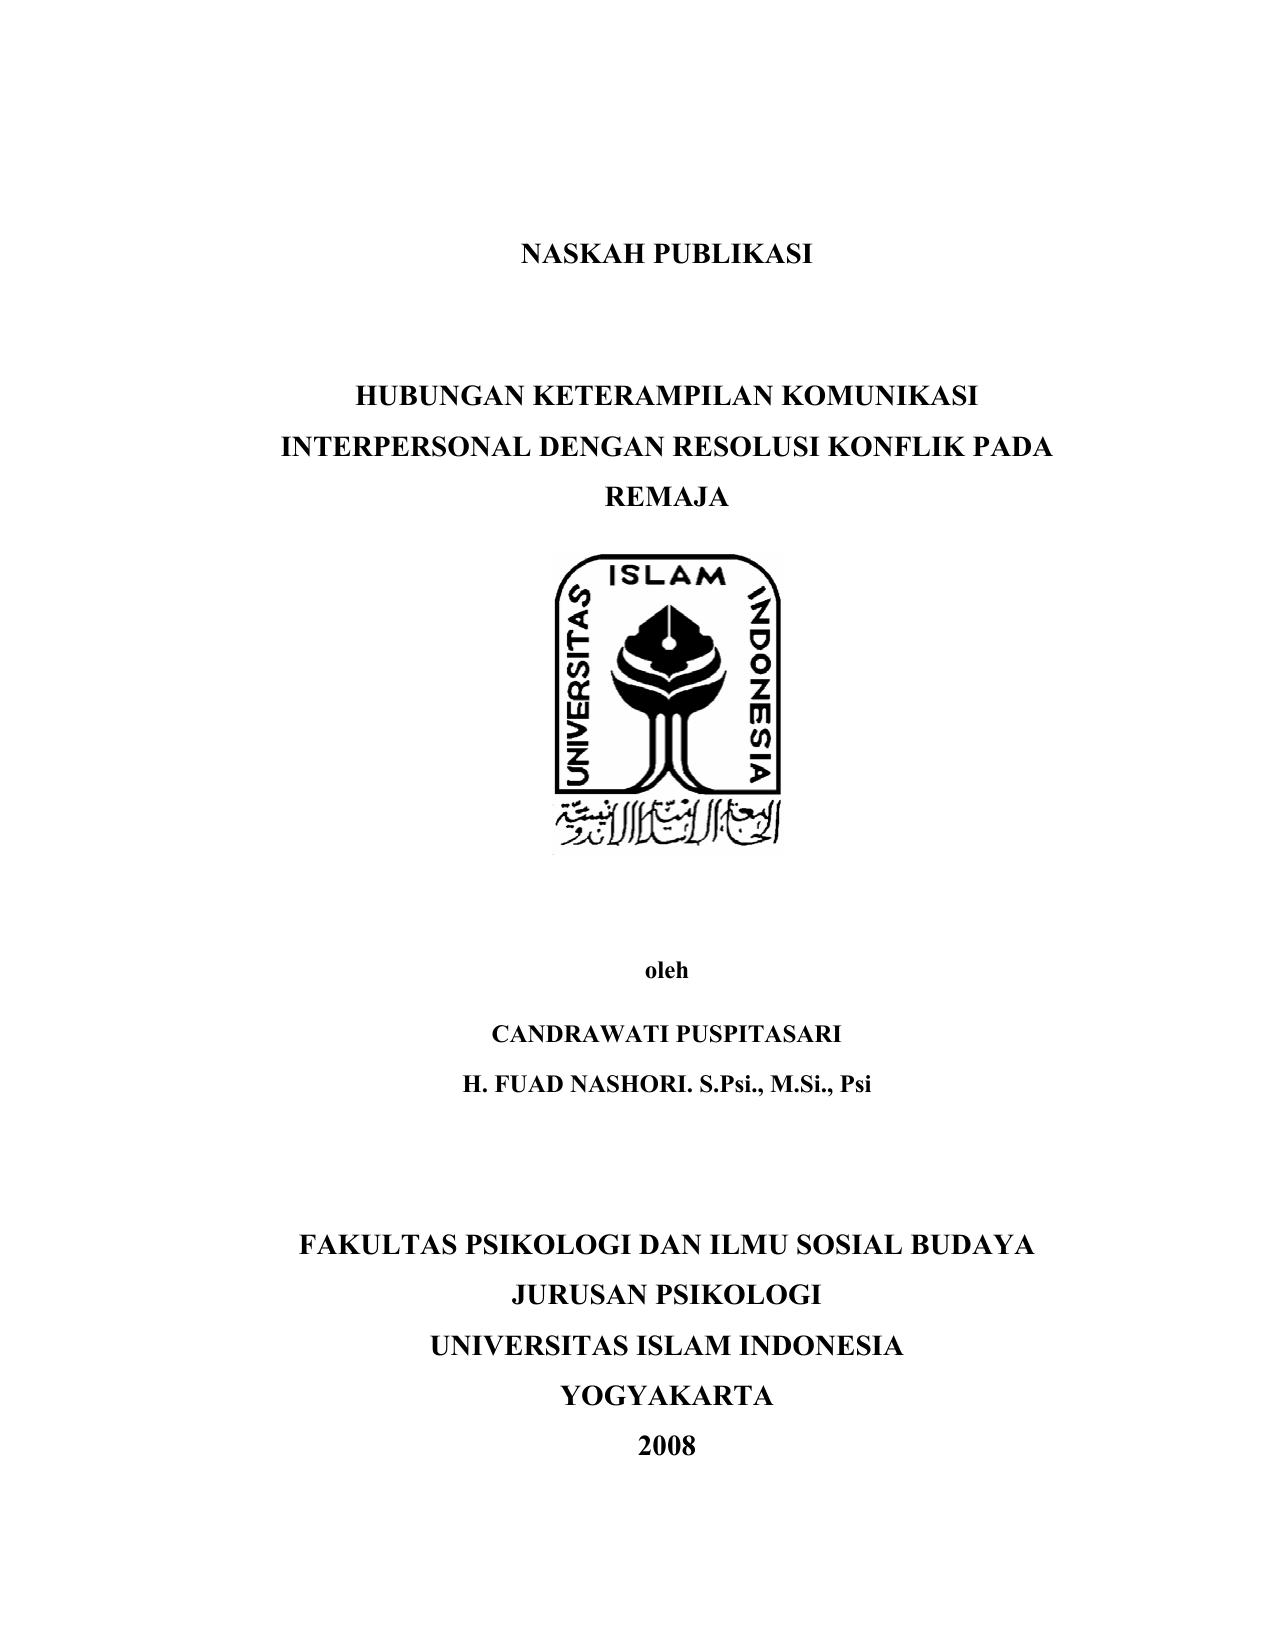 Naskah Publikasi Hubungan Keterampilan Komunikasi Interpersonal